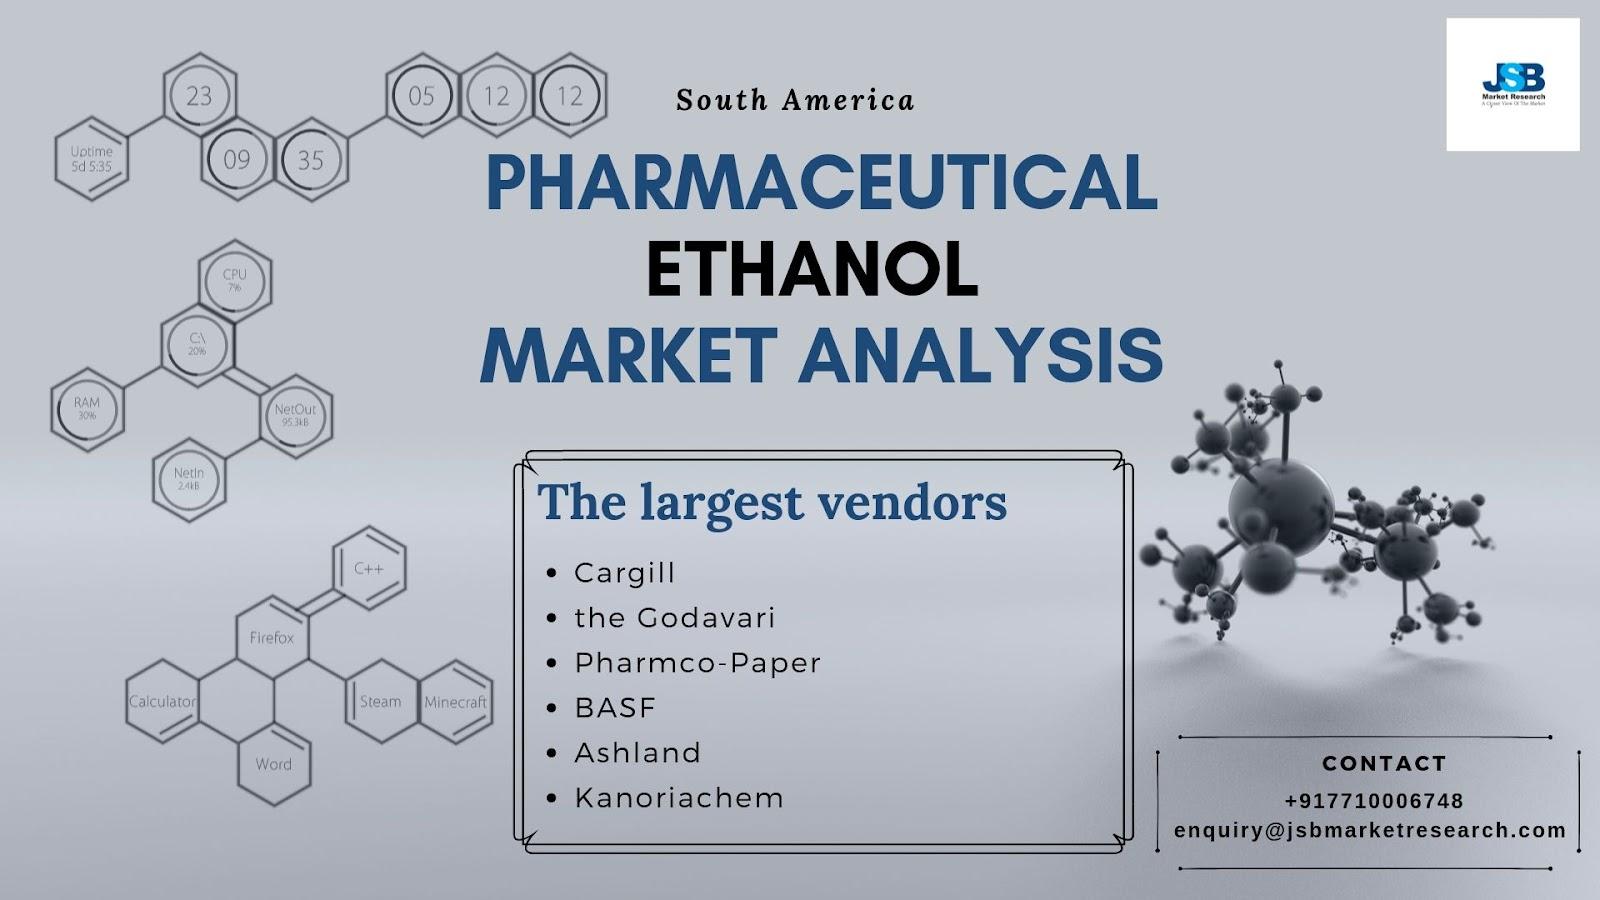 Pharmaceutical Ethanol Market Analysis